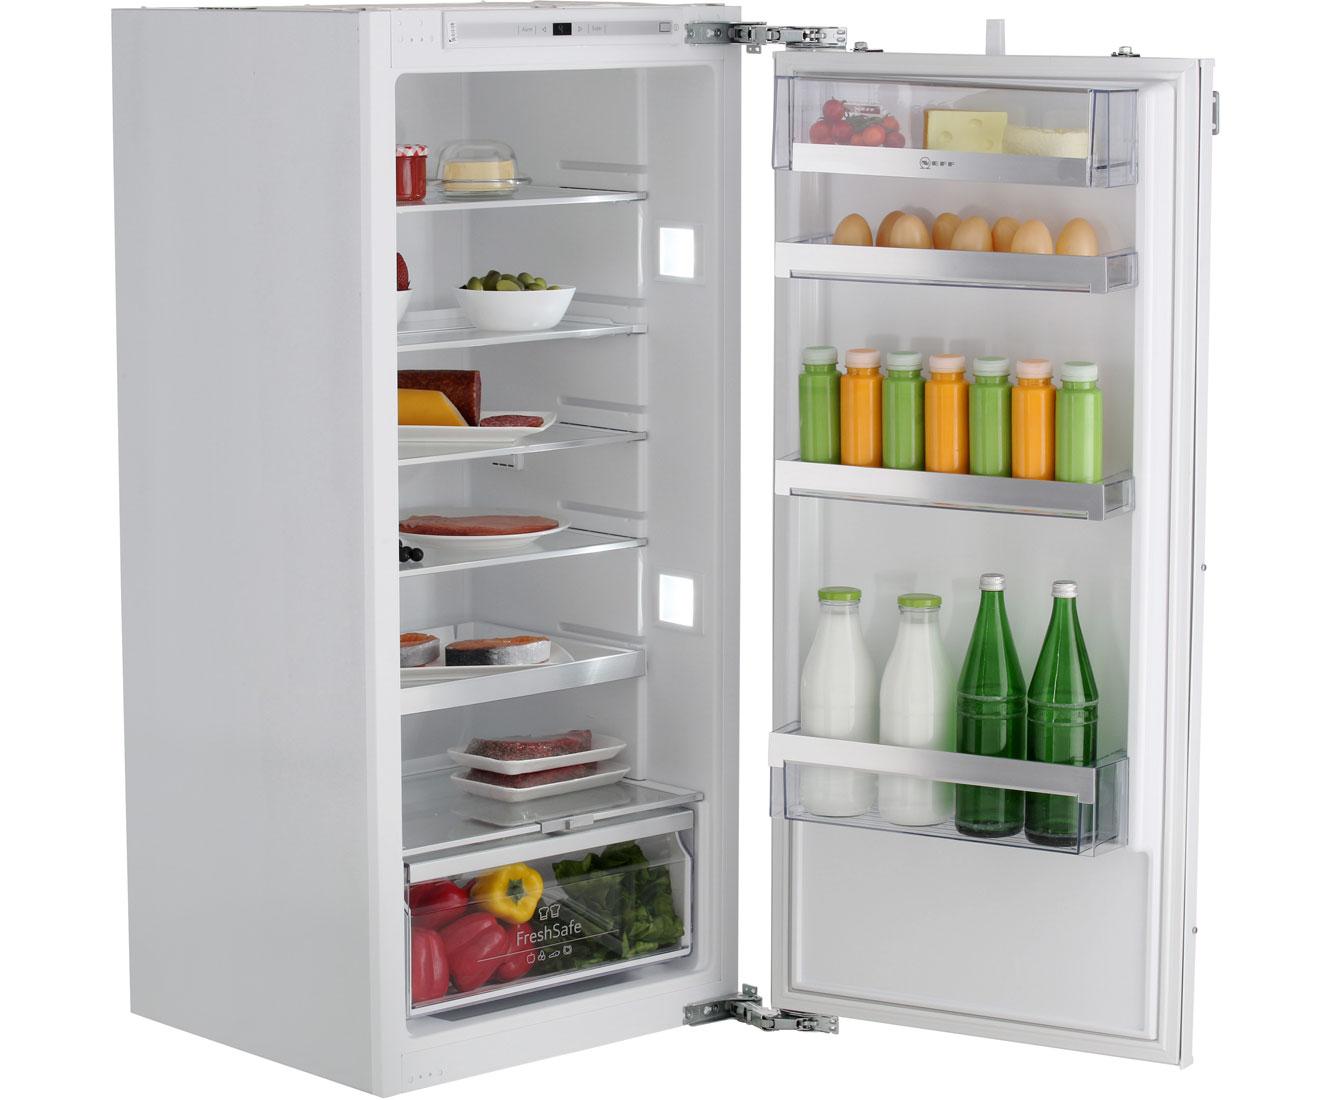 Side By Side Kühlschrank Neff : Neff k a ki d einbau kühlschrank er nische festtür